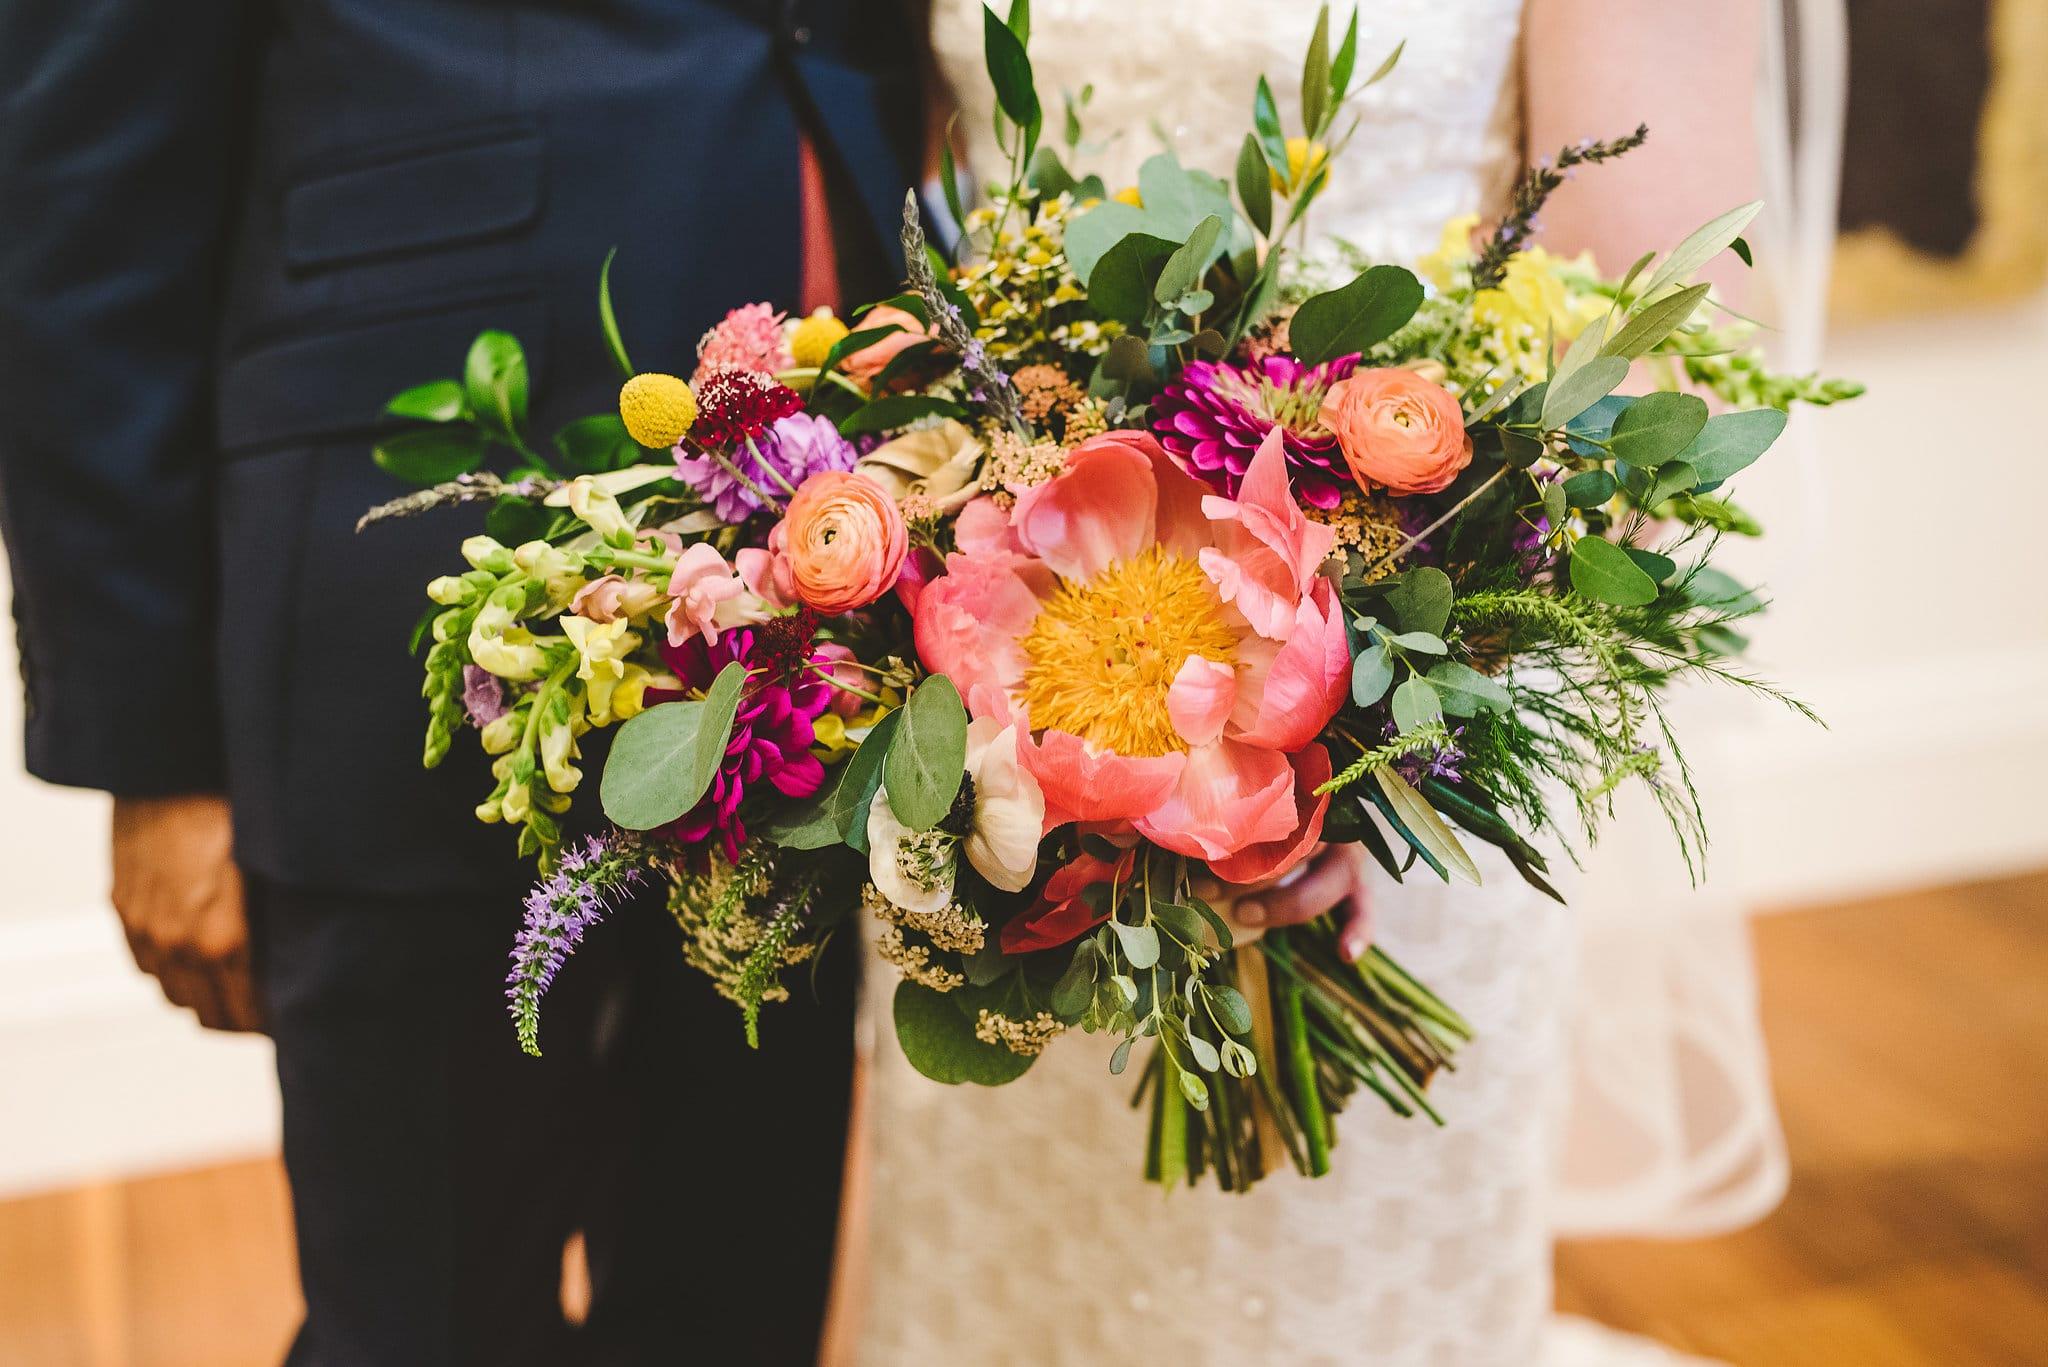 Gorgeous bridal bouquet with peonies, ranunculus, dahlias, eucalyptus, mint leaves